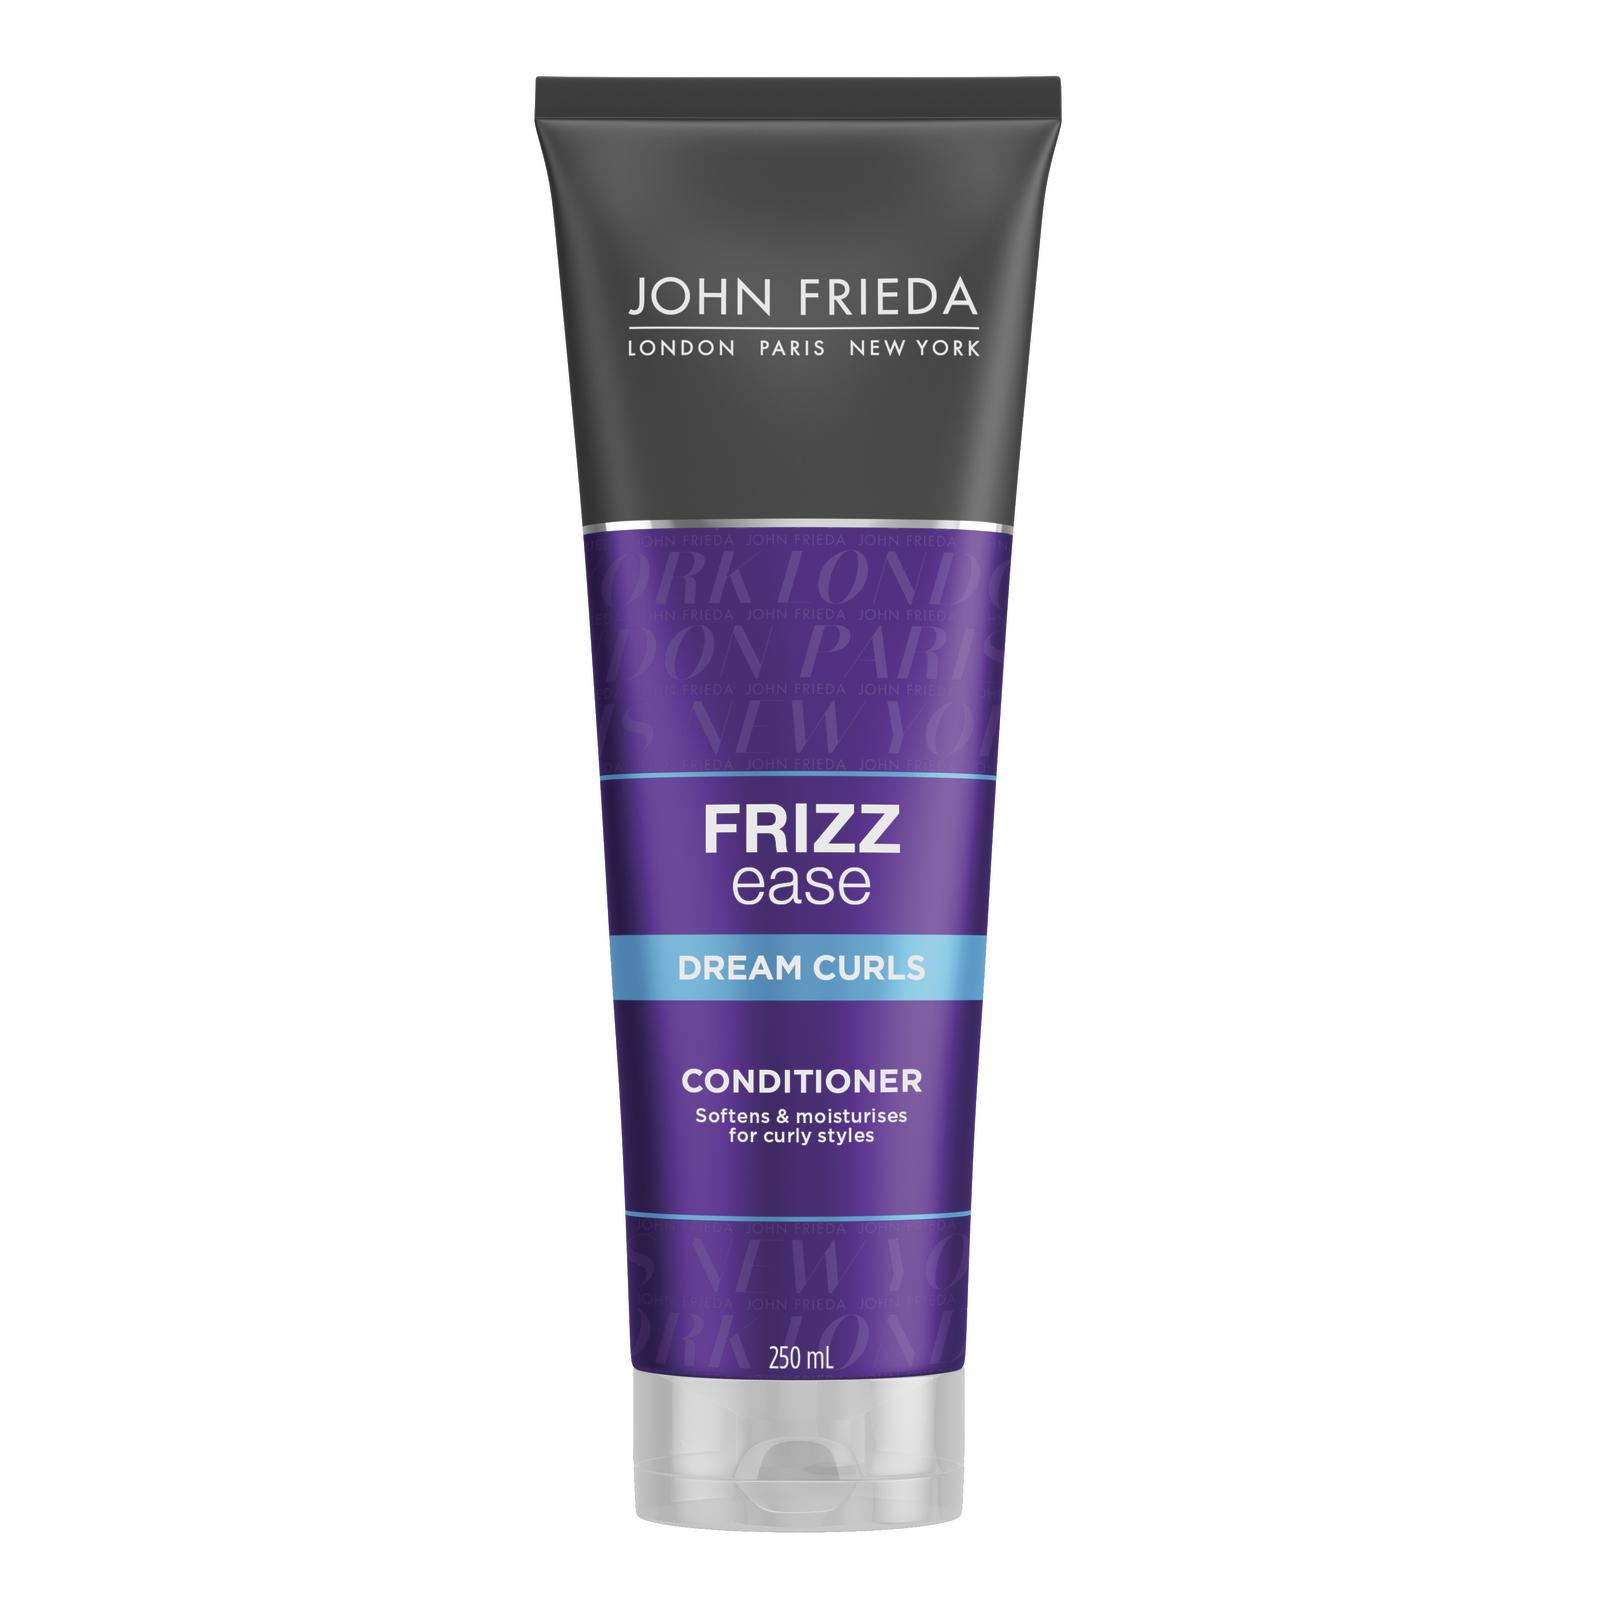 John Frieda Frizz Ease Dream Curls Conditioner (250ml) image